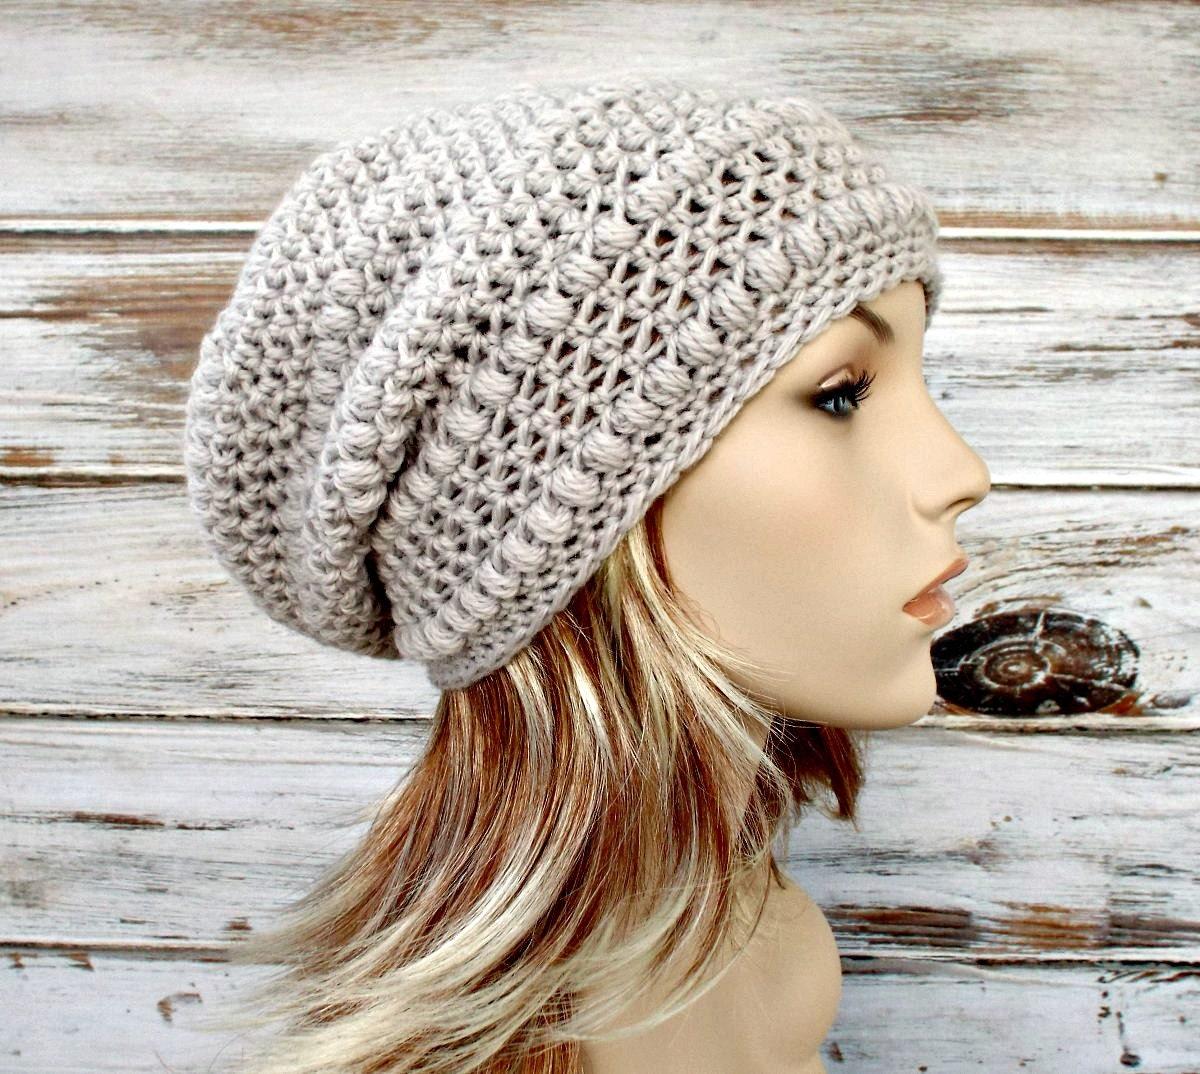 Crochet Slouch Hat: Crochet Hat Womens Hat Penelope Puff Stitch Slouchy Beanie